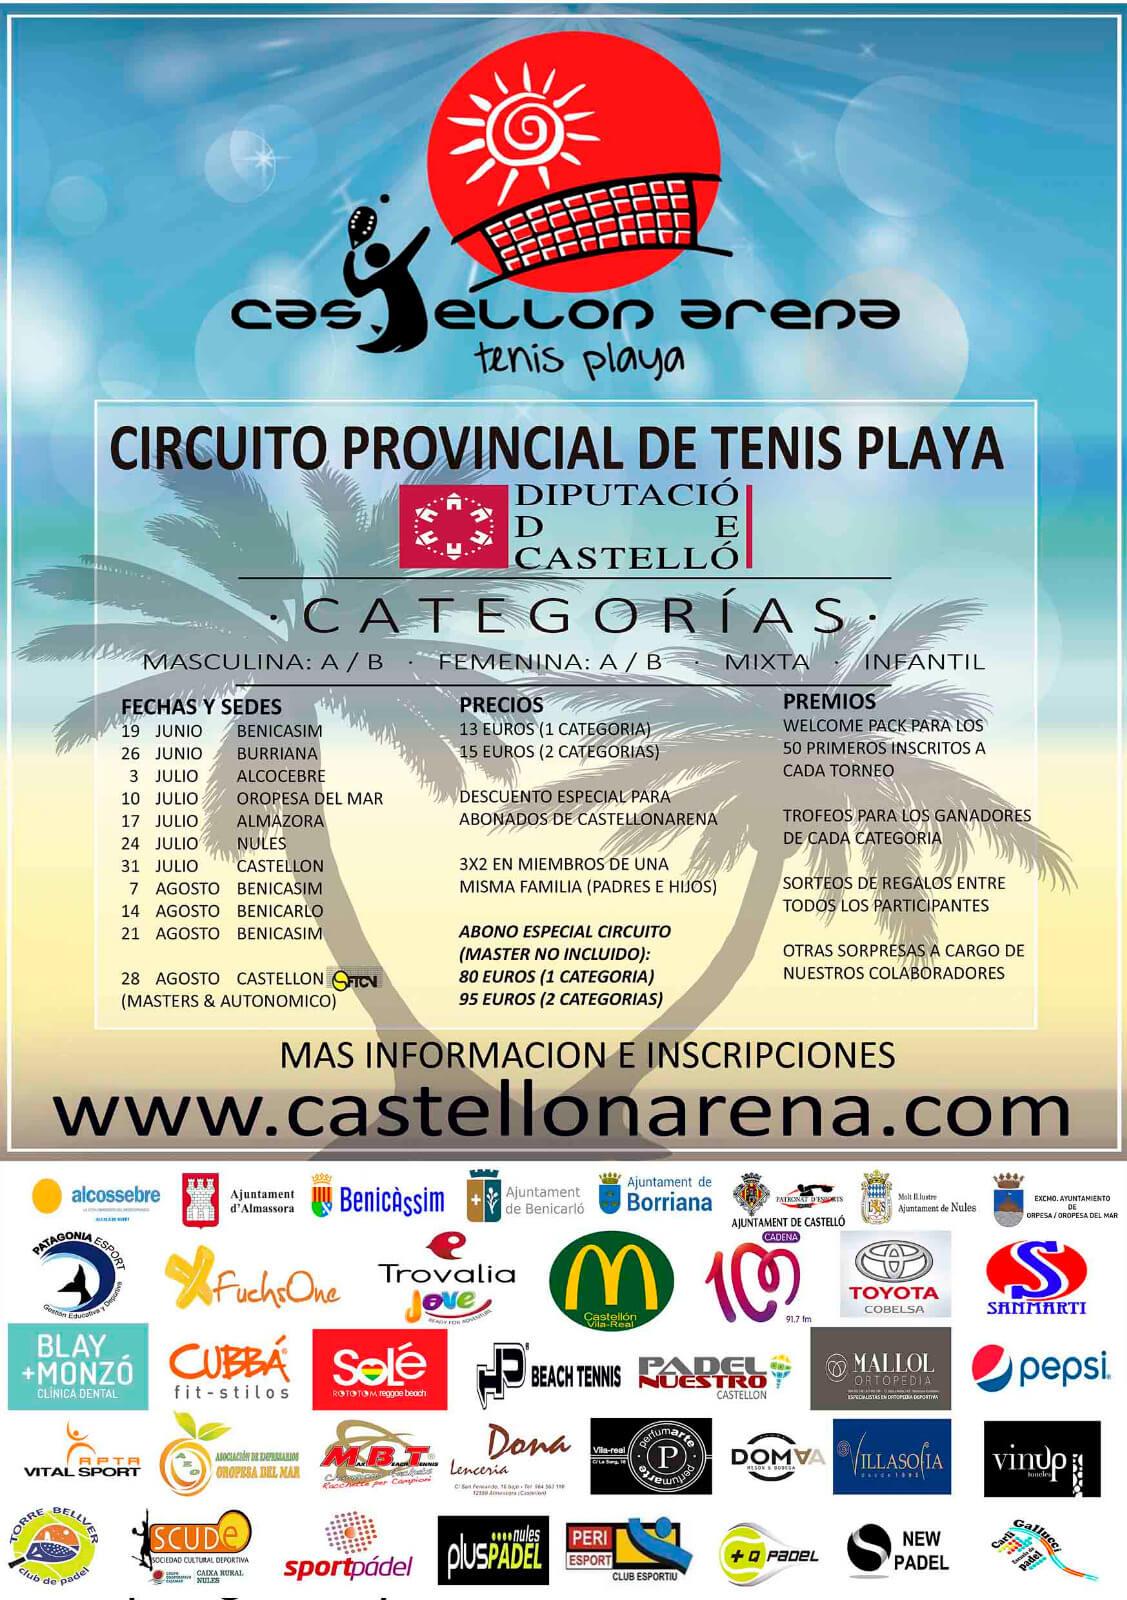 Castellon Arena